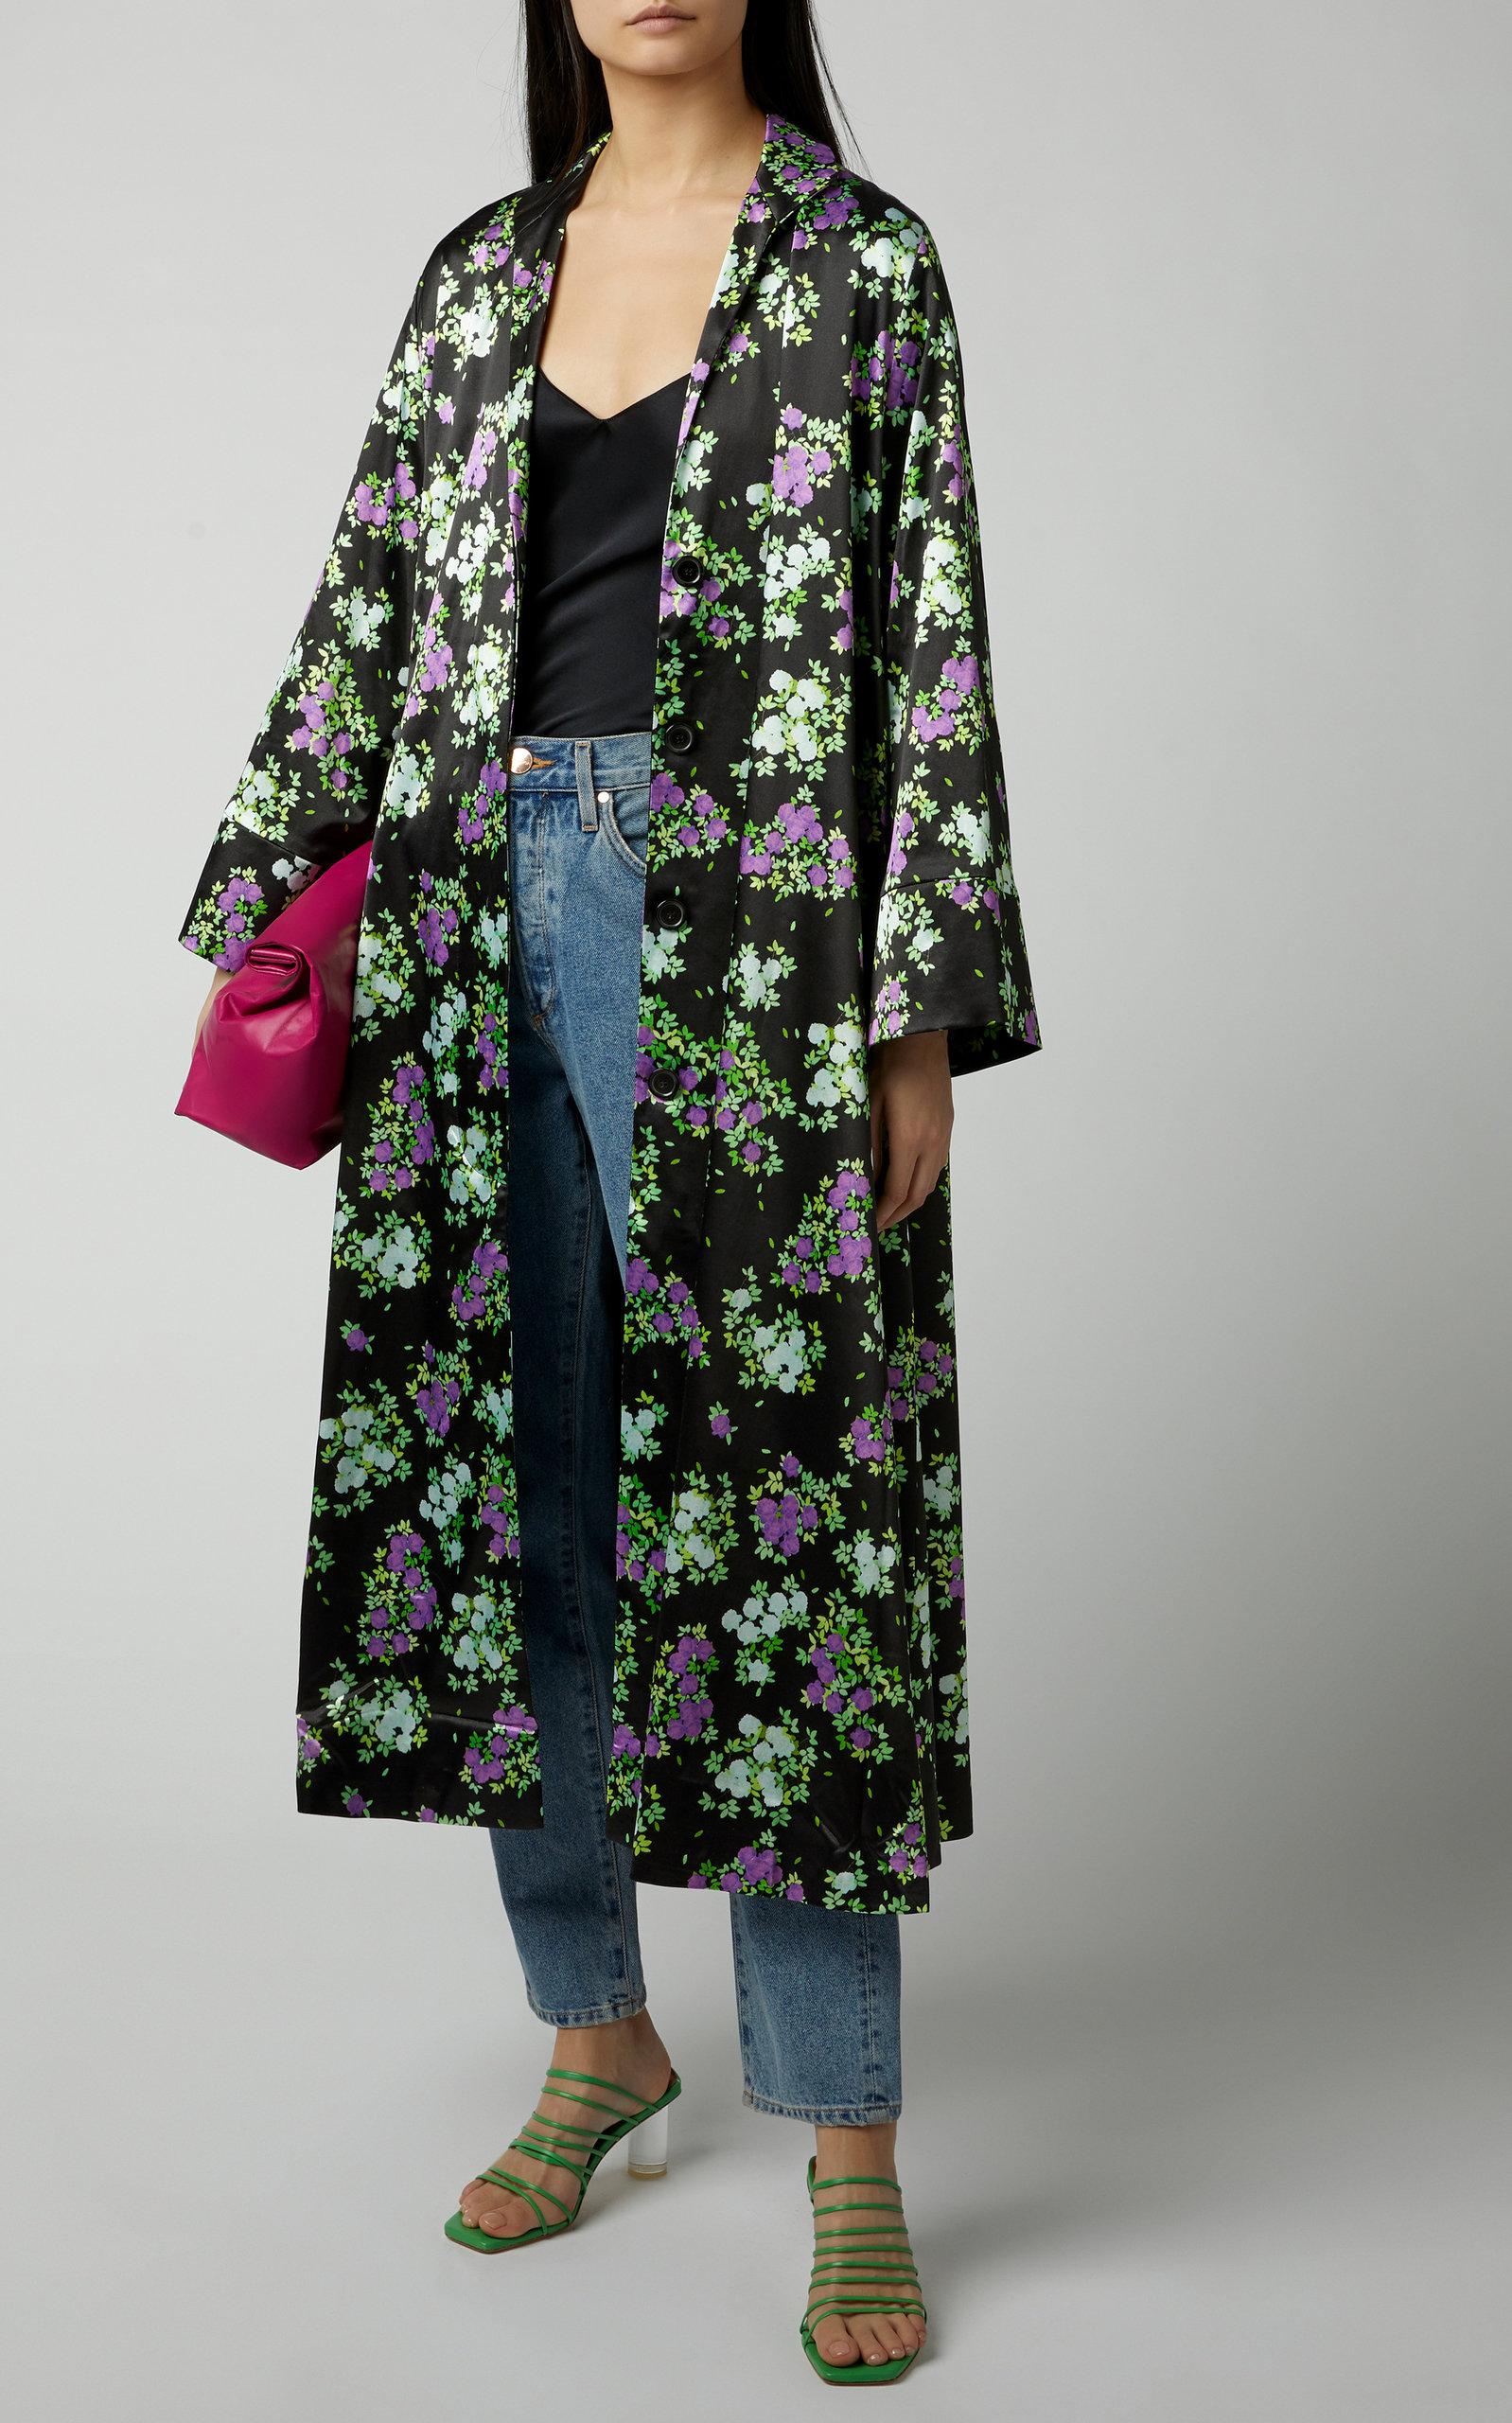 2f7ede4e3 Women's Clothing | Moda Operandi | Moda Operandi